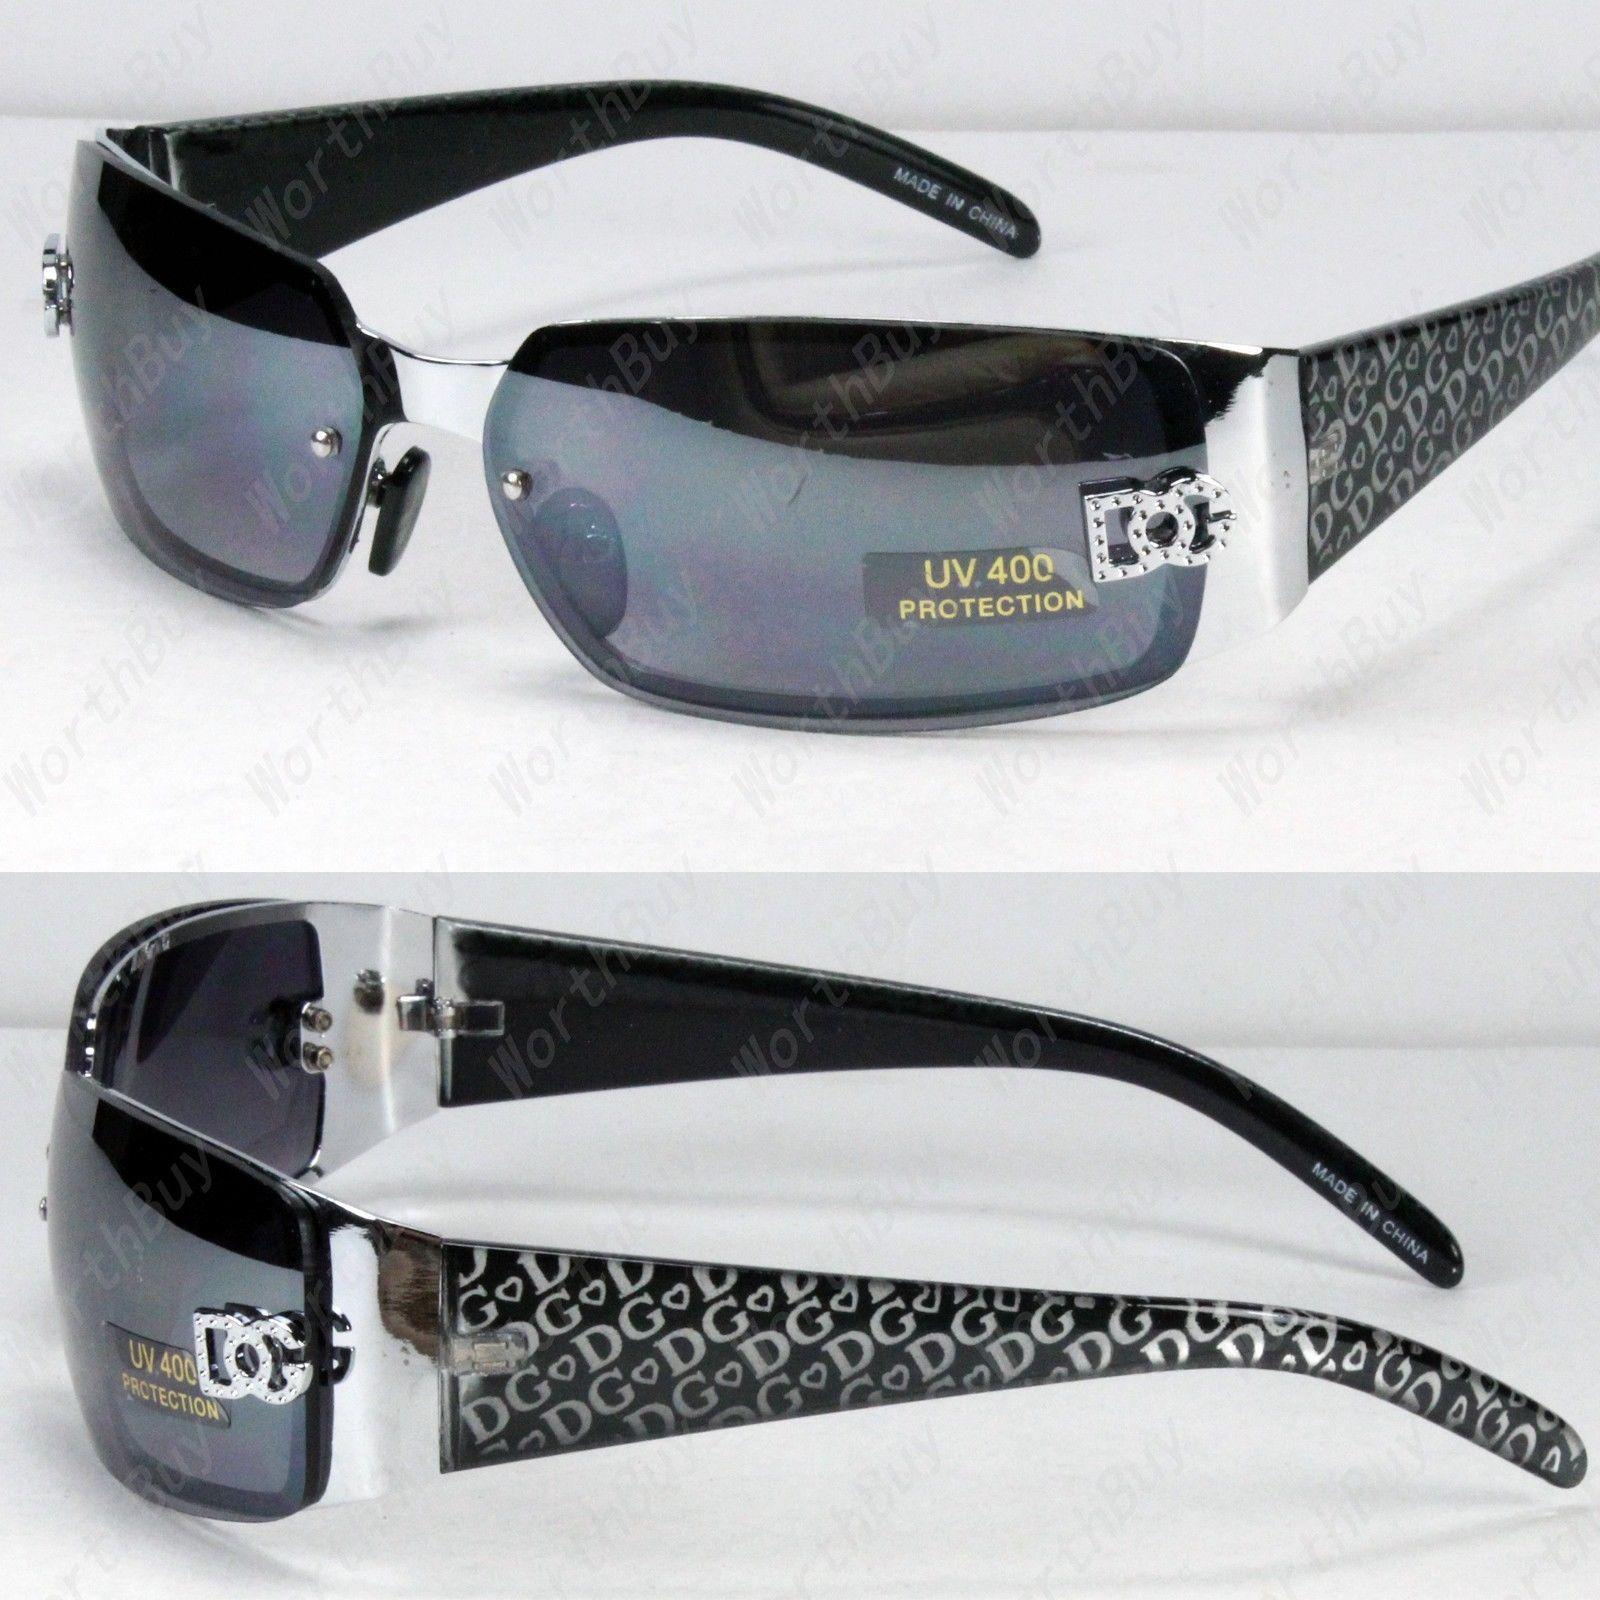 451a8c5a4b Dg Eyewear Womens Fashion Designer Sunglasses Shades Black Silver Around.  US-DEALS New DG Eyewear Womens Wrap Rectangular ...